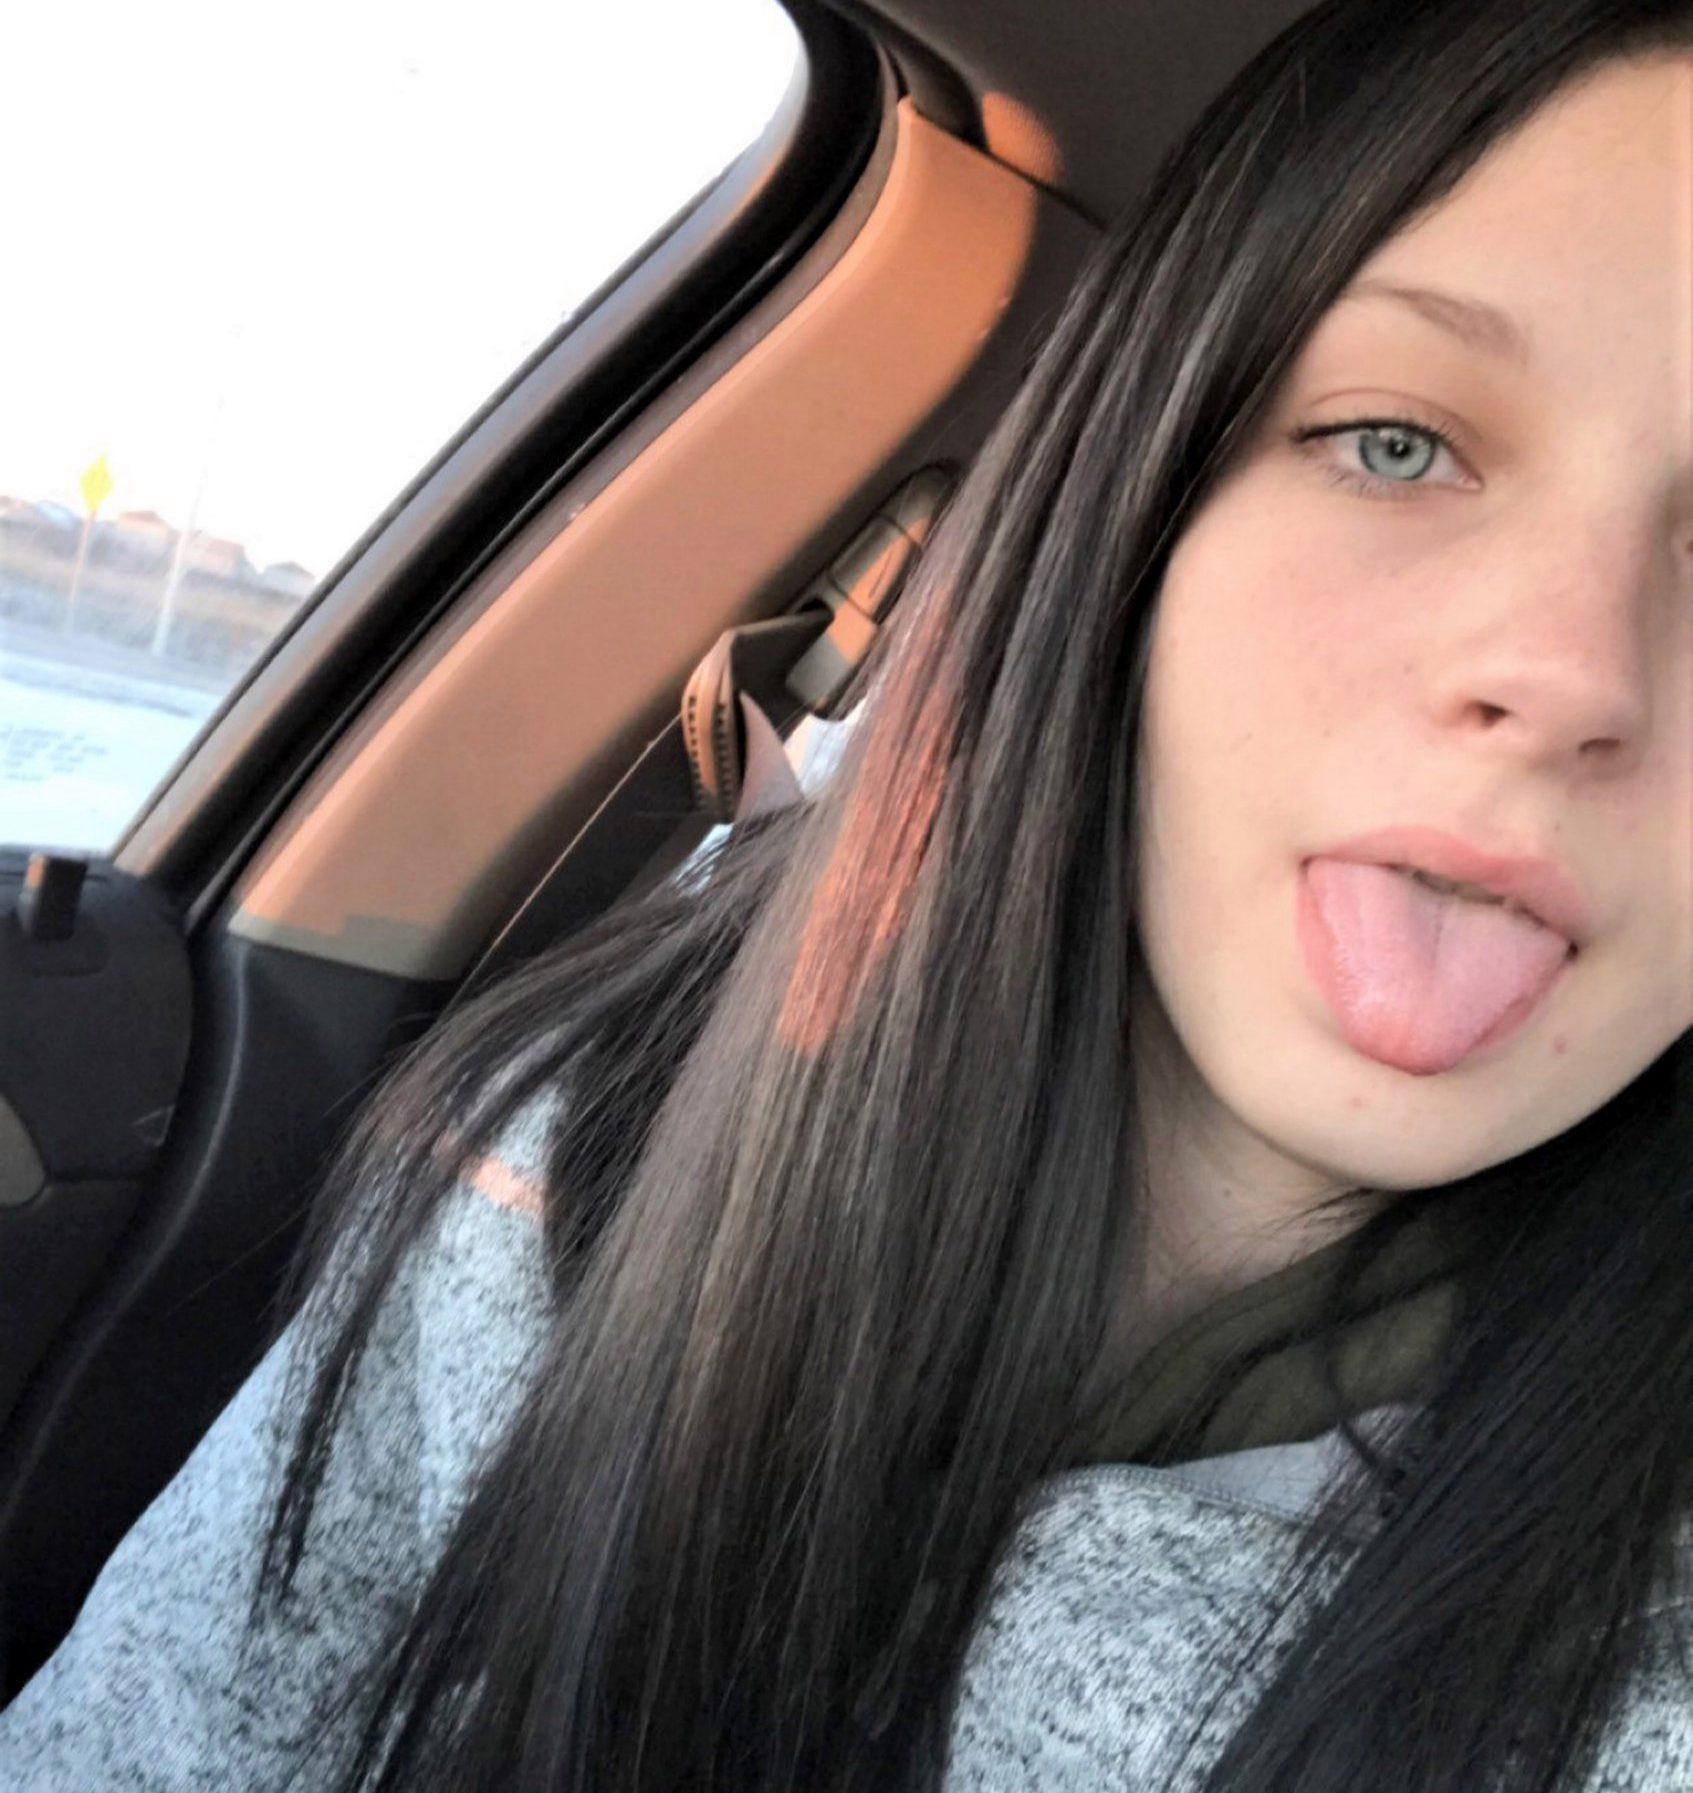 Josie Laro, 19, from Grand Forks, North Dakota, USA, before she bleached her hair